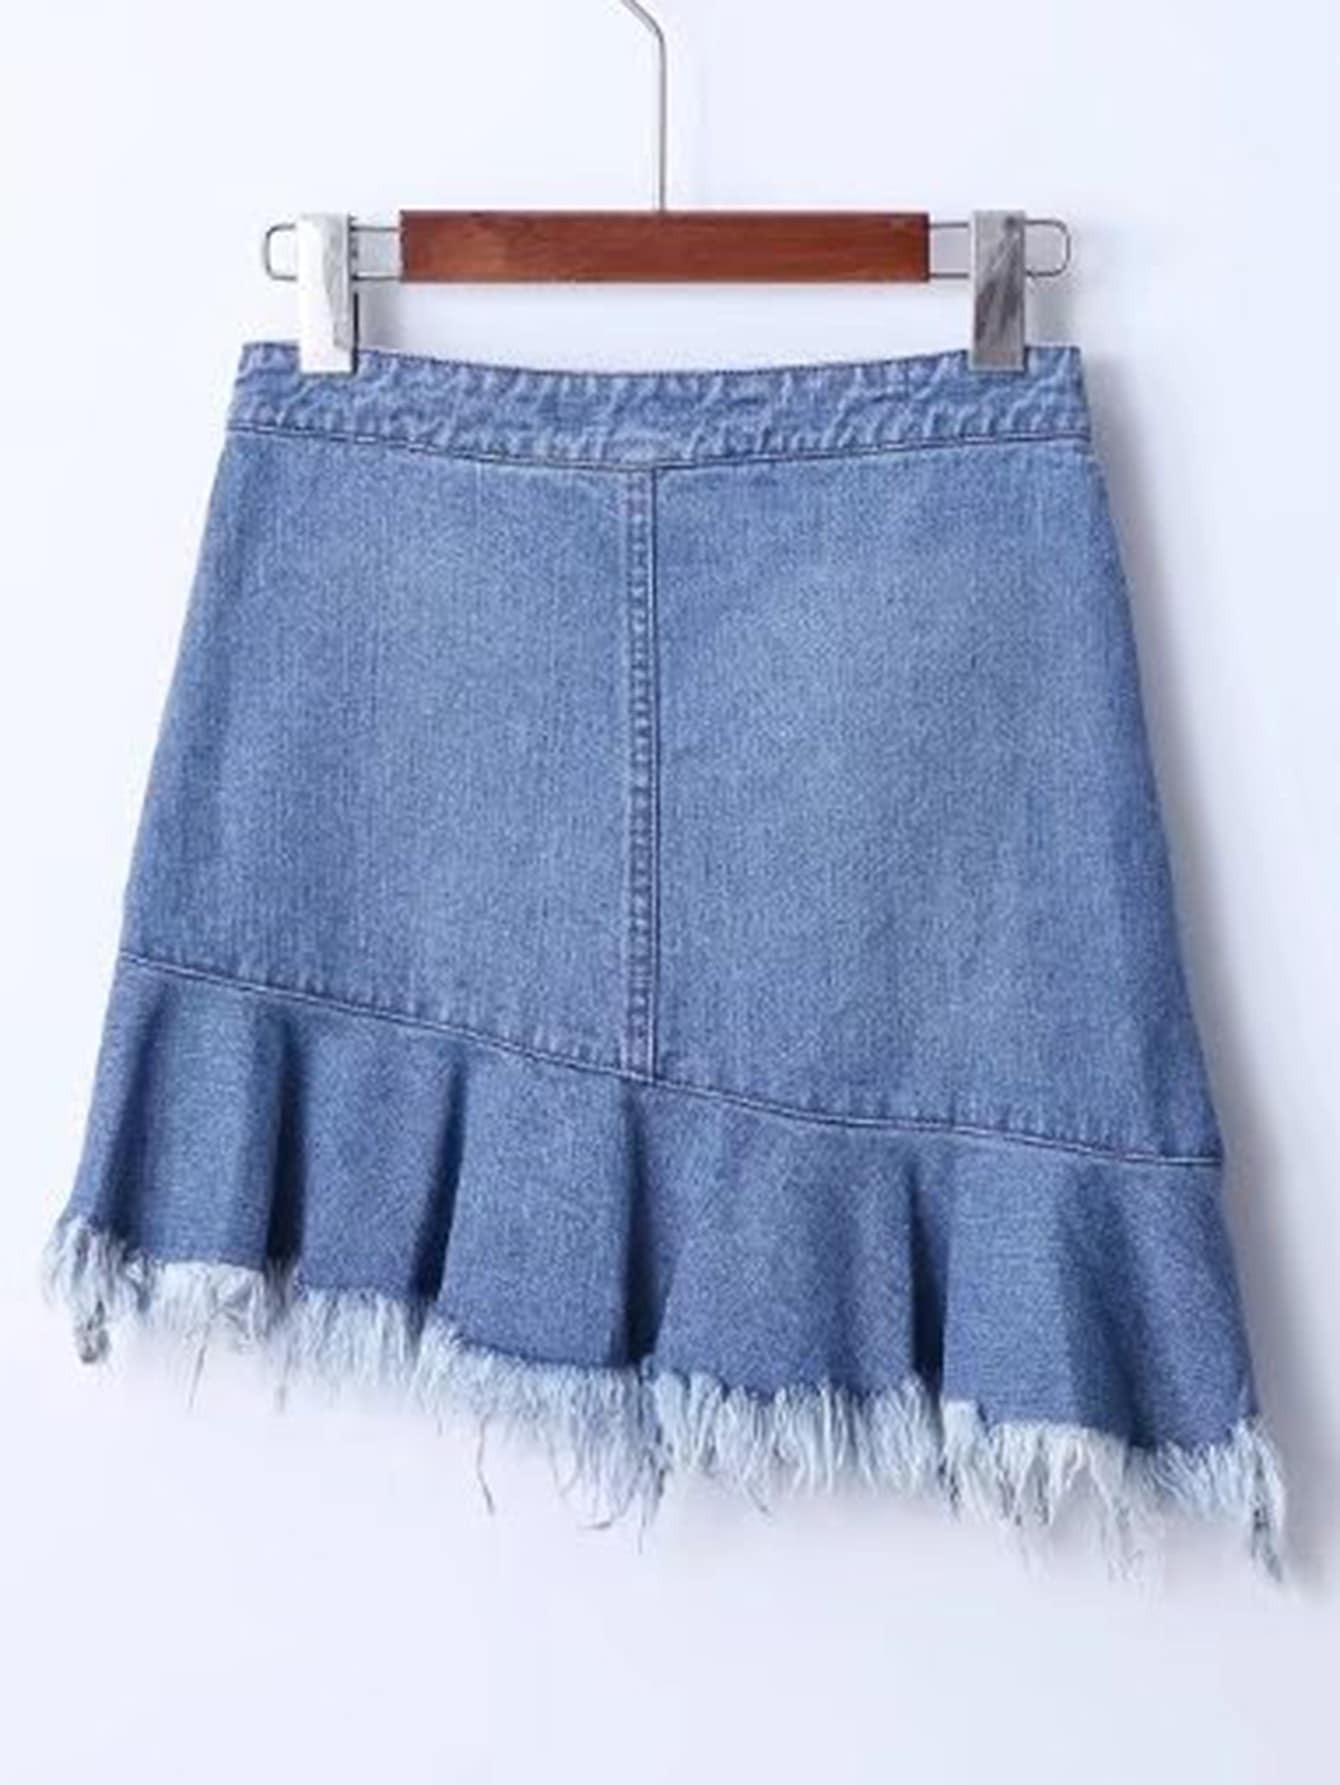 jupe en jeans asym trique avec pan d chir french romwe. Black Bedroom Furniture Sets. Home Design Ideas